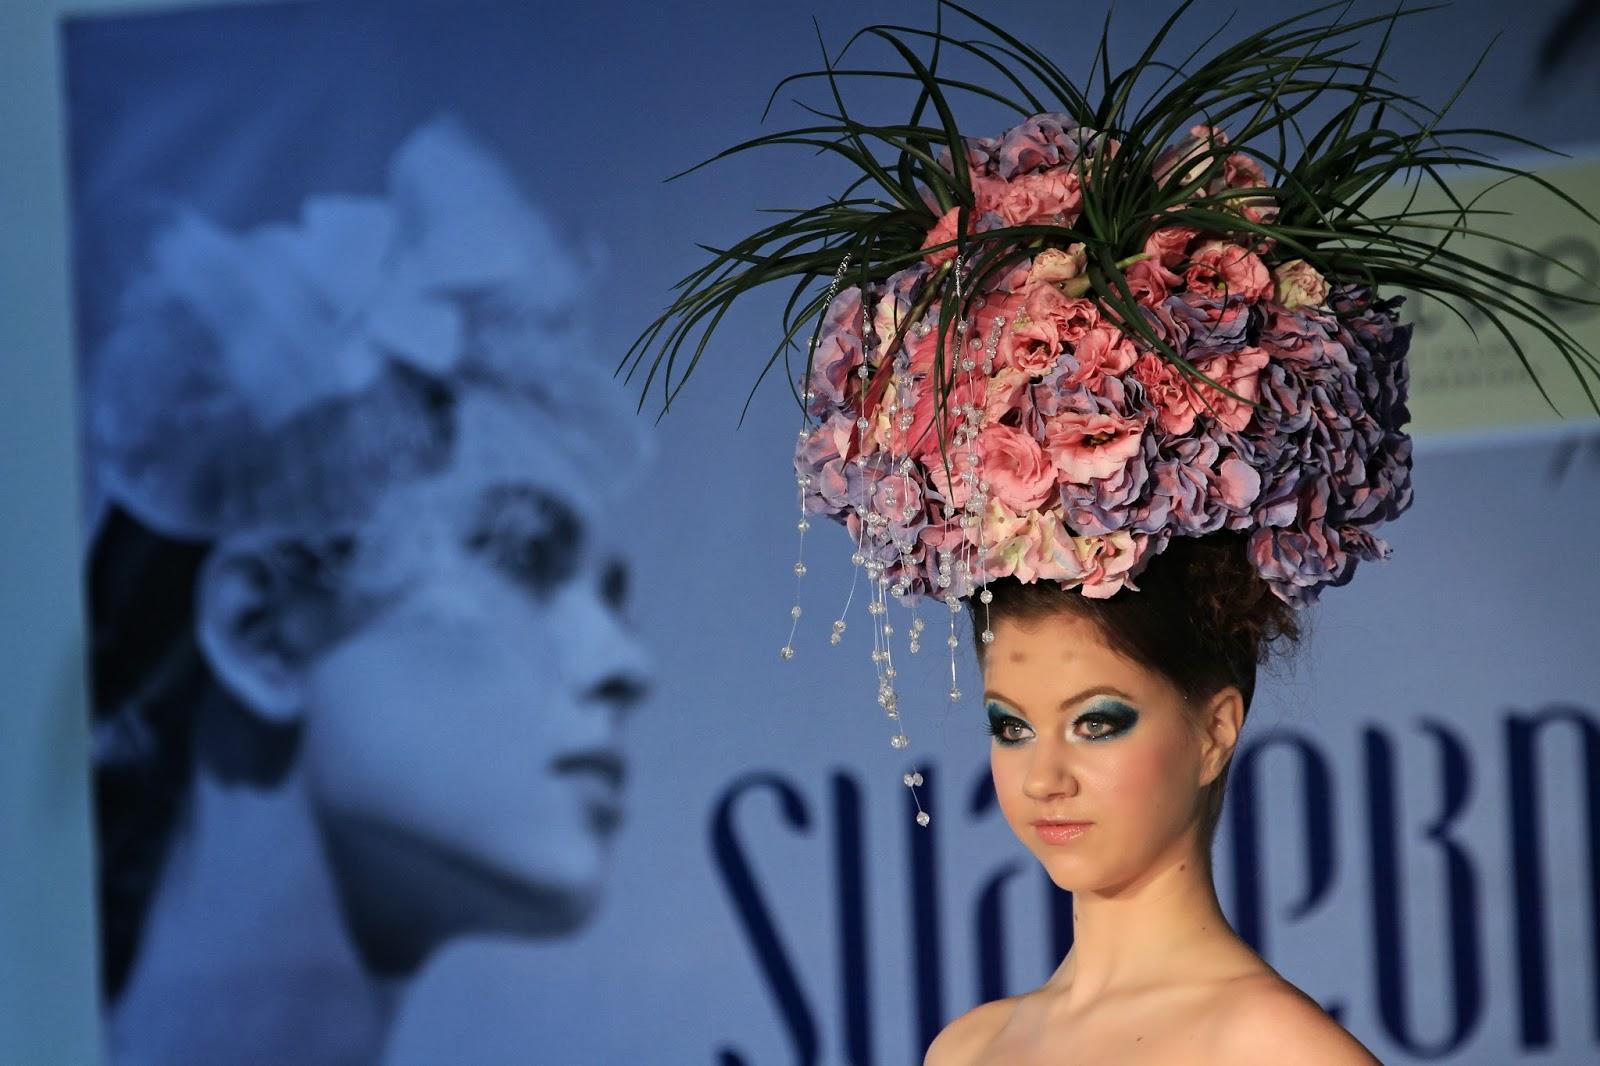 Bouquet, Brno, Creation, Czech Republic, Fair, Fashion, Flowers, Pictures, Showbiz, Wear, Wedding, Women,